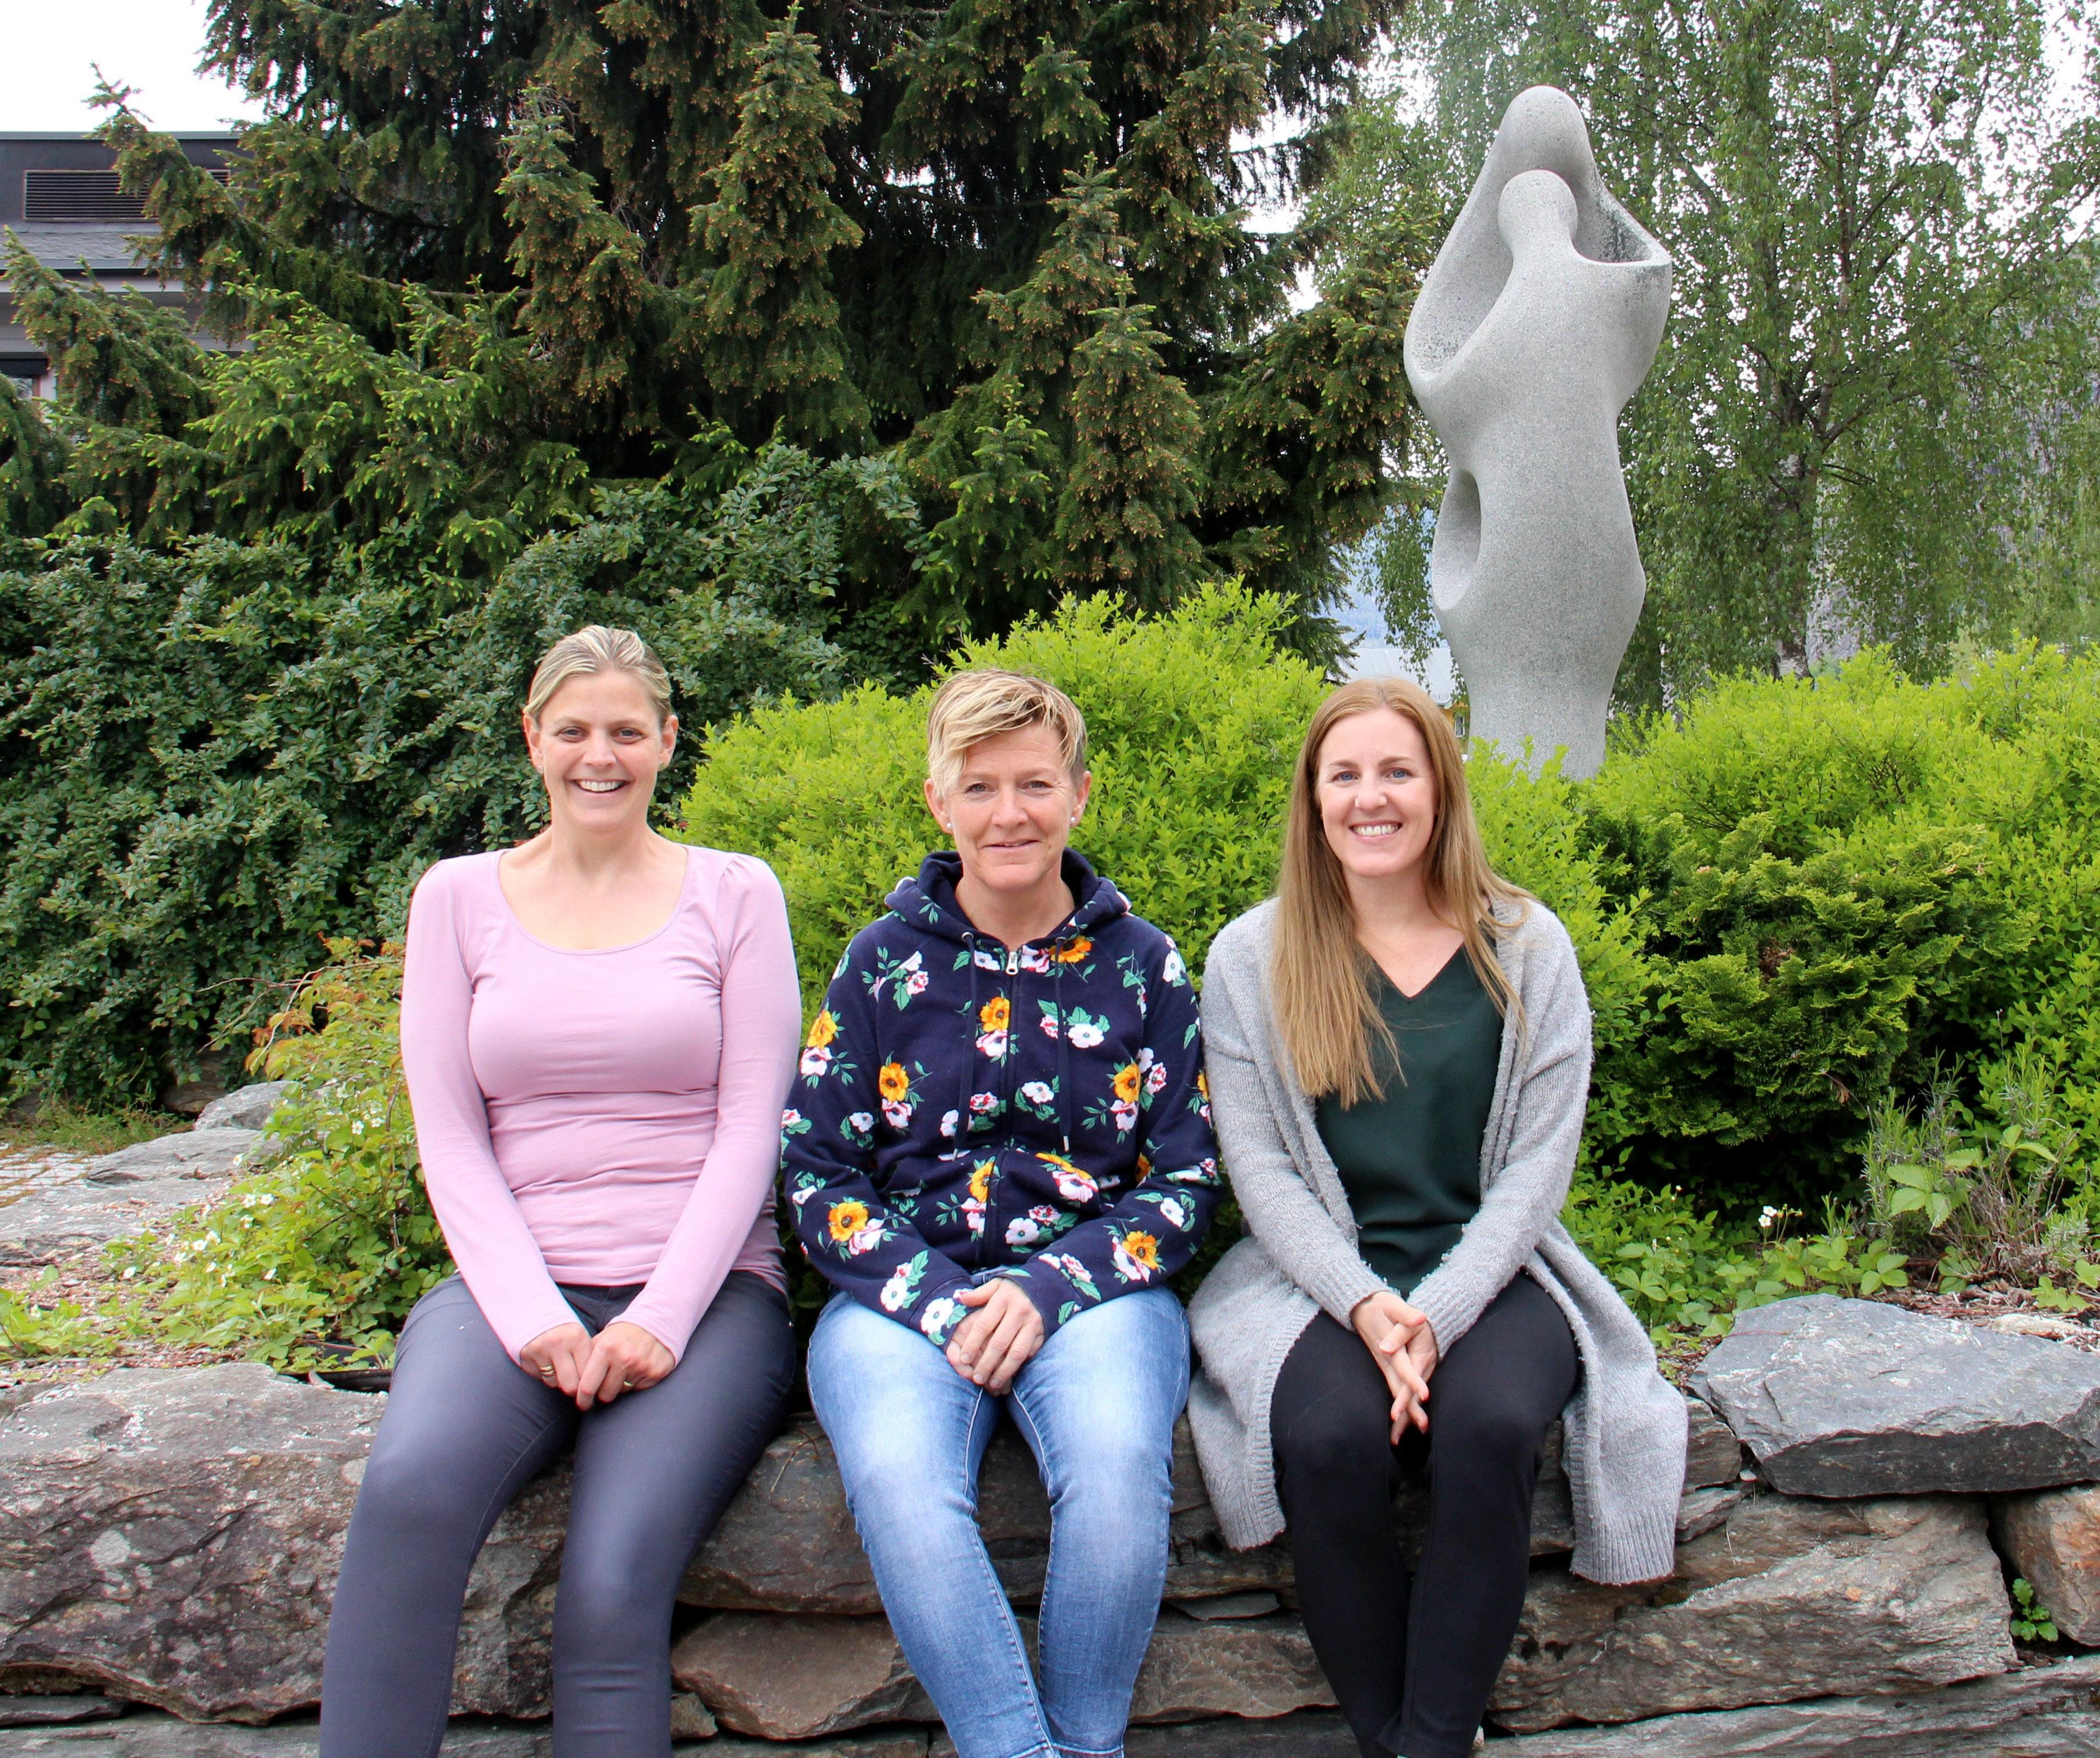 Elisabeth Bondevik Orrestad, Linda Goldmann og Trine-Anita Systad.JPG